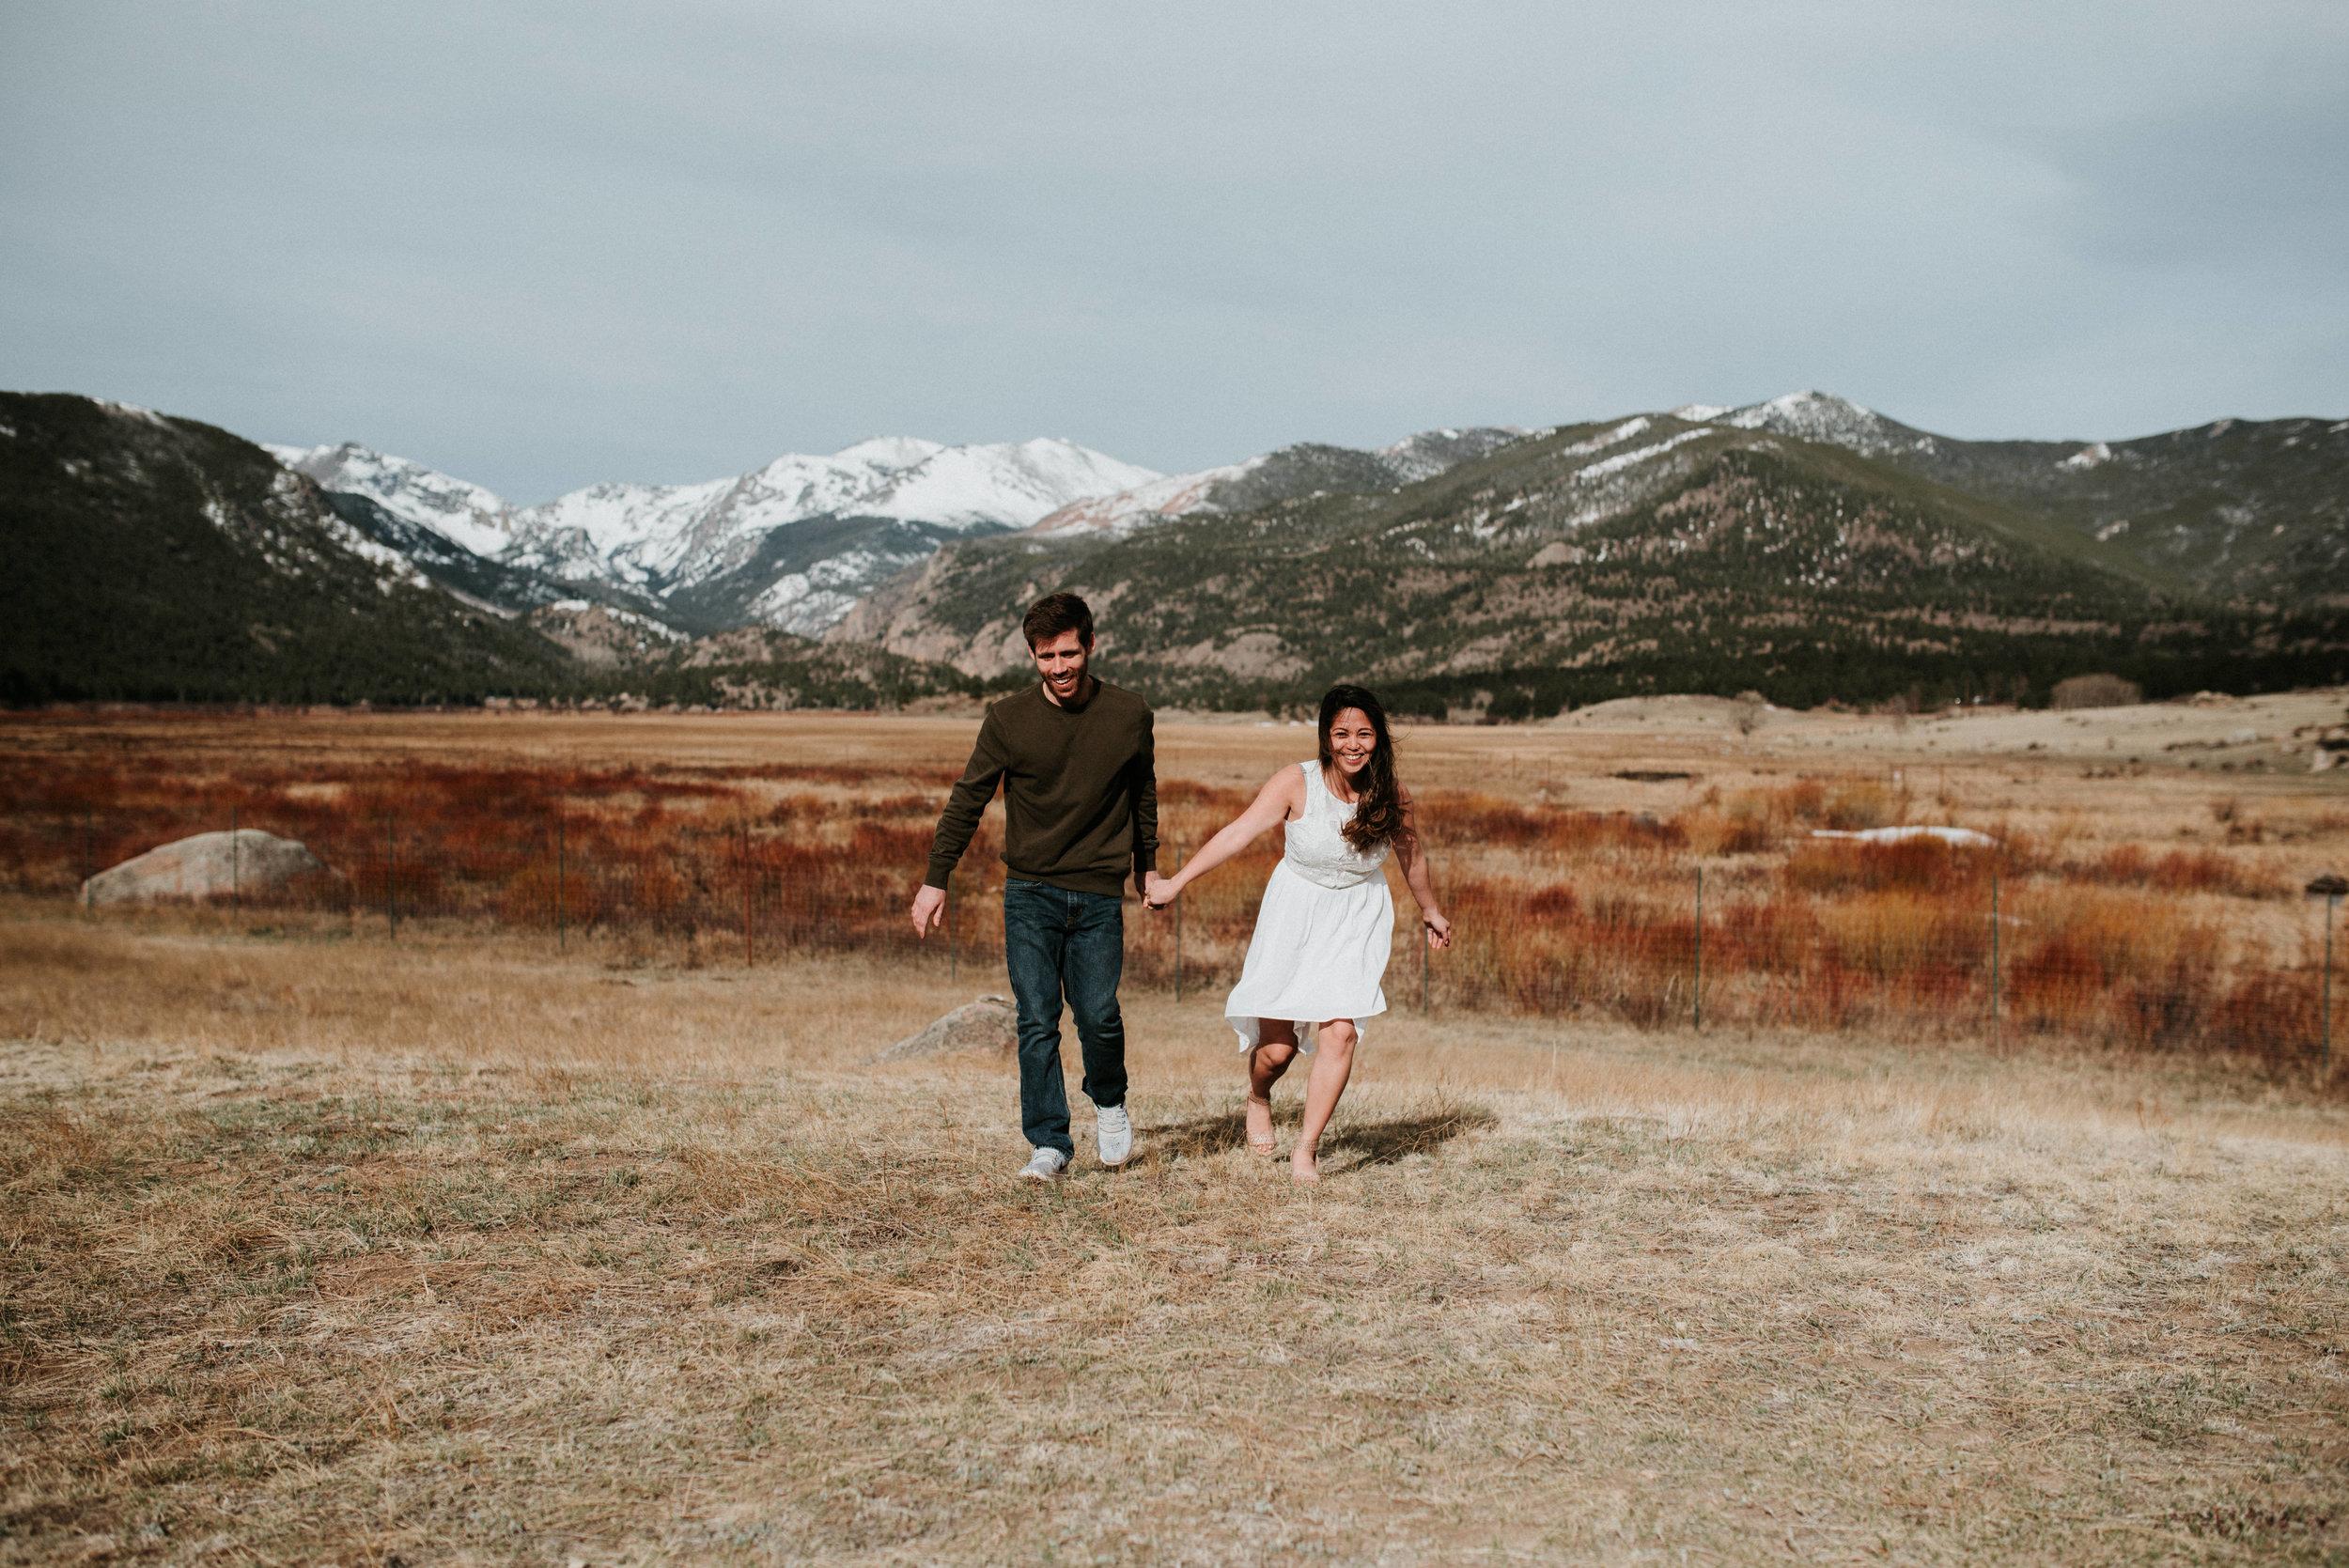 Zach&Rosalie Rocky Mountain National Park Engagement Denver Colorado Rocky Mountain Wedding Photographer00012.jpg